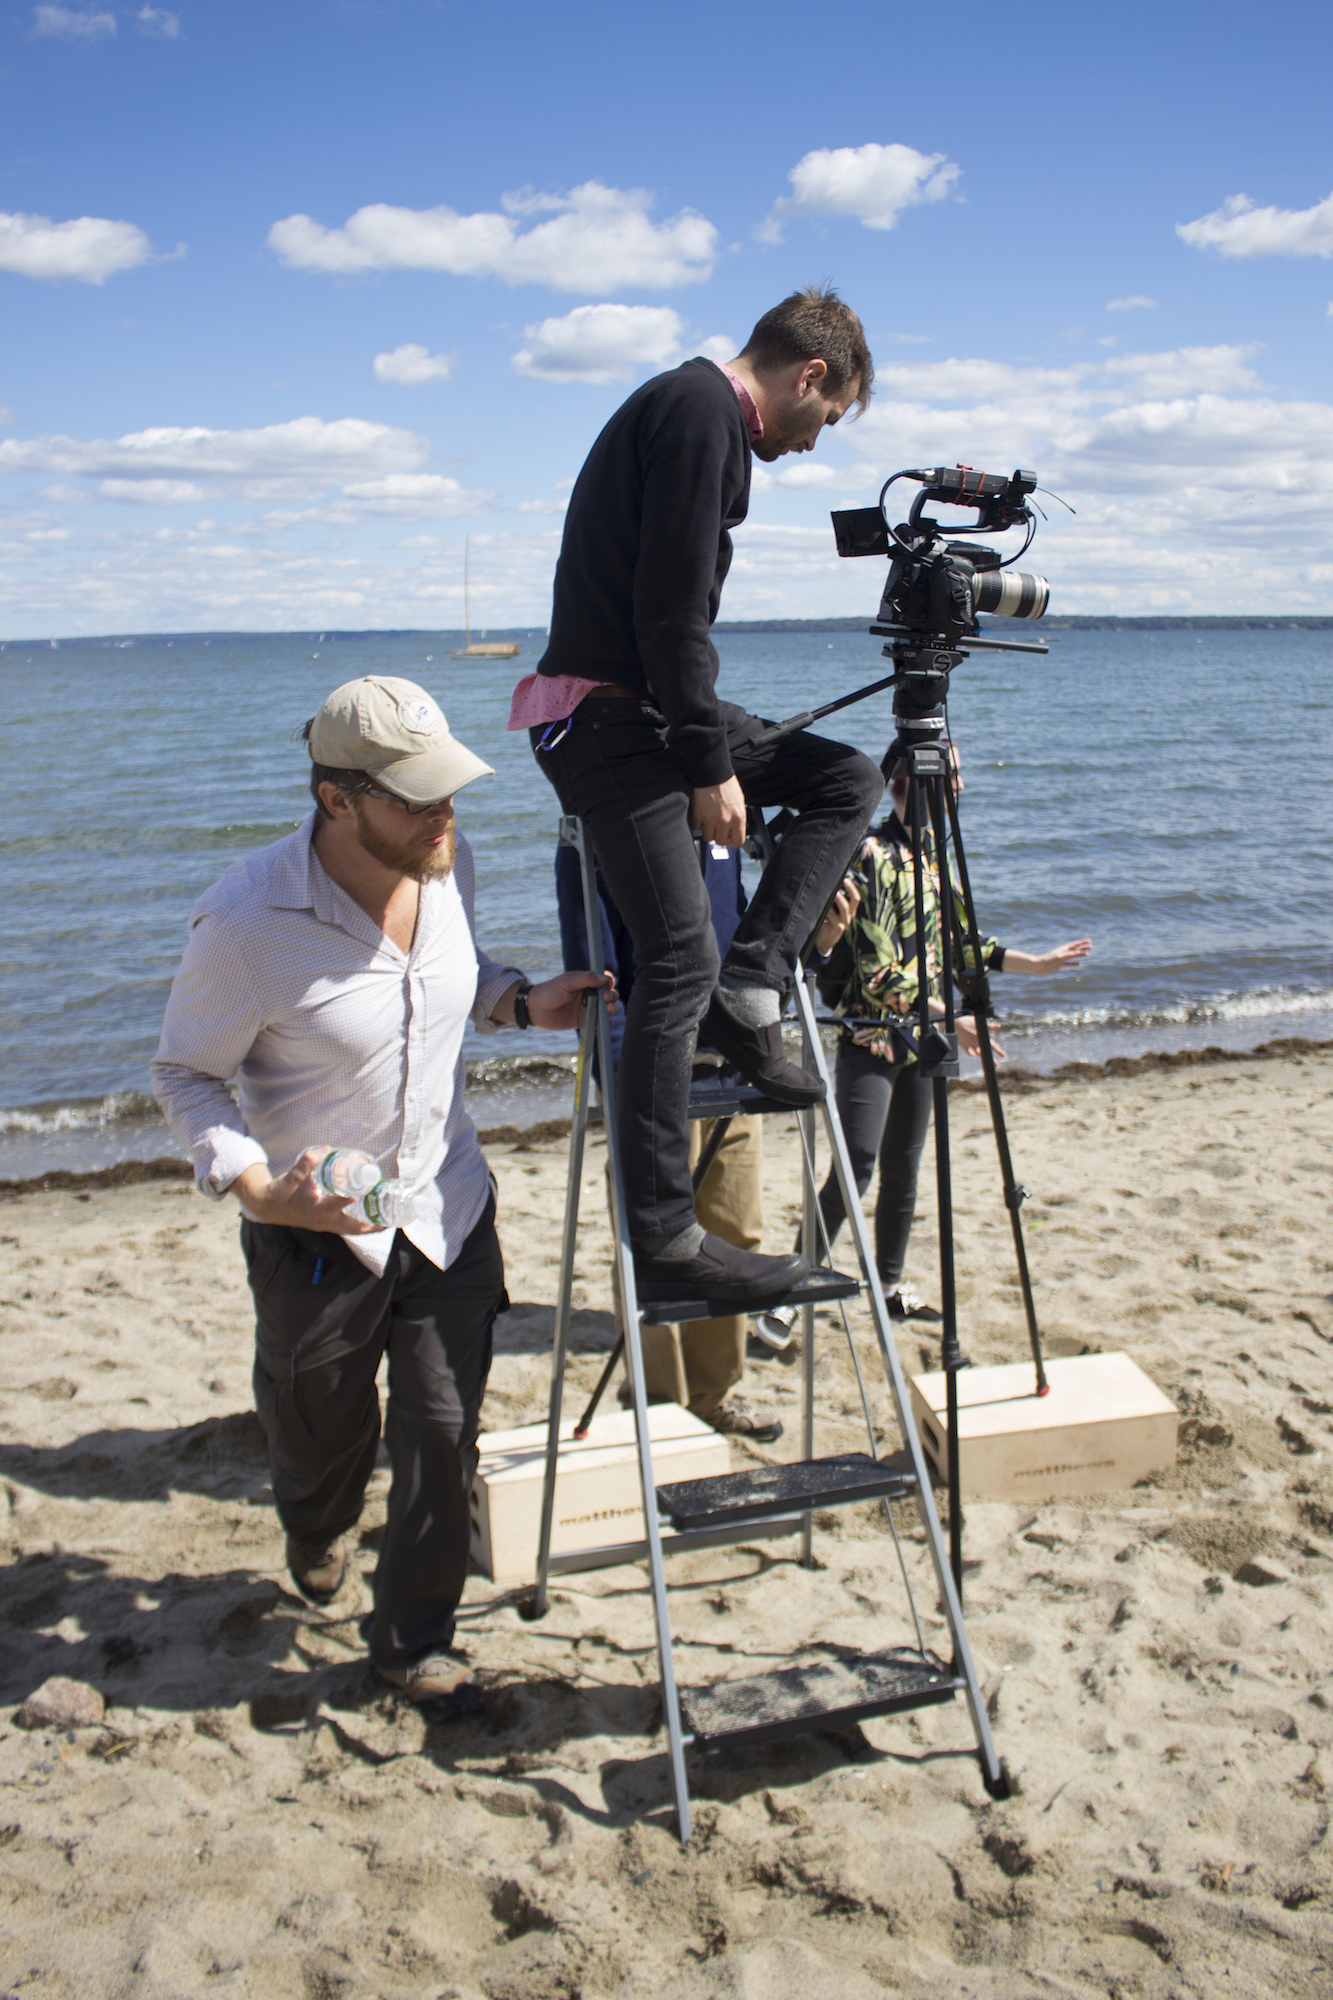 Grip/Gaffer Dan Perez de la Garza with Director of Photography Denez McAdoo on the set of Geena Matuson's production of 'Fauxmercials' beach ads, September 2016.